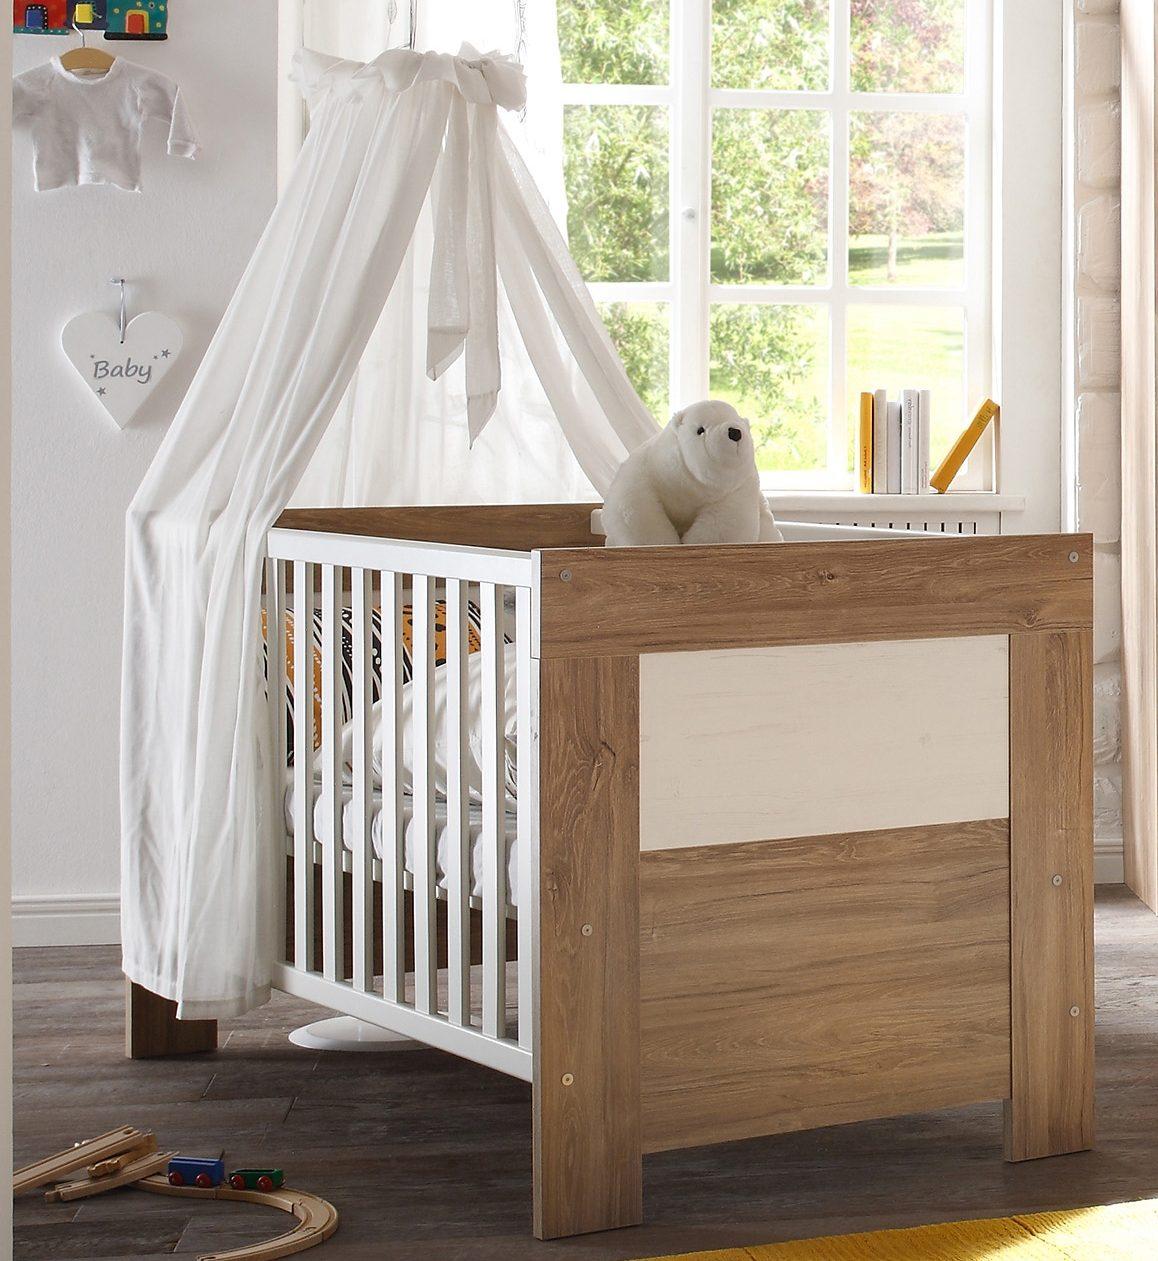 Babybett zur Babymöbel Serie »Granny«, in stirling oak/ anderson pine